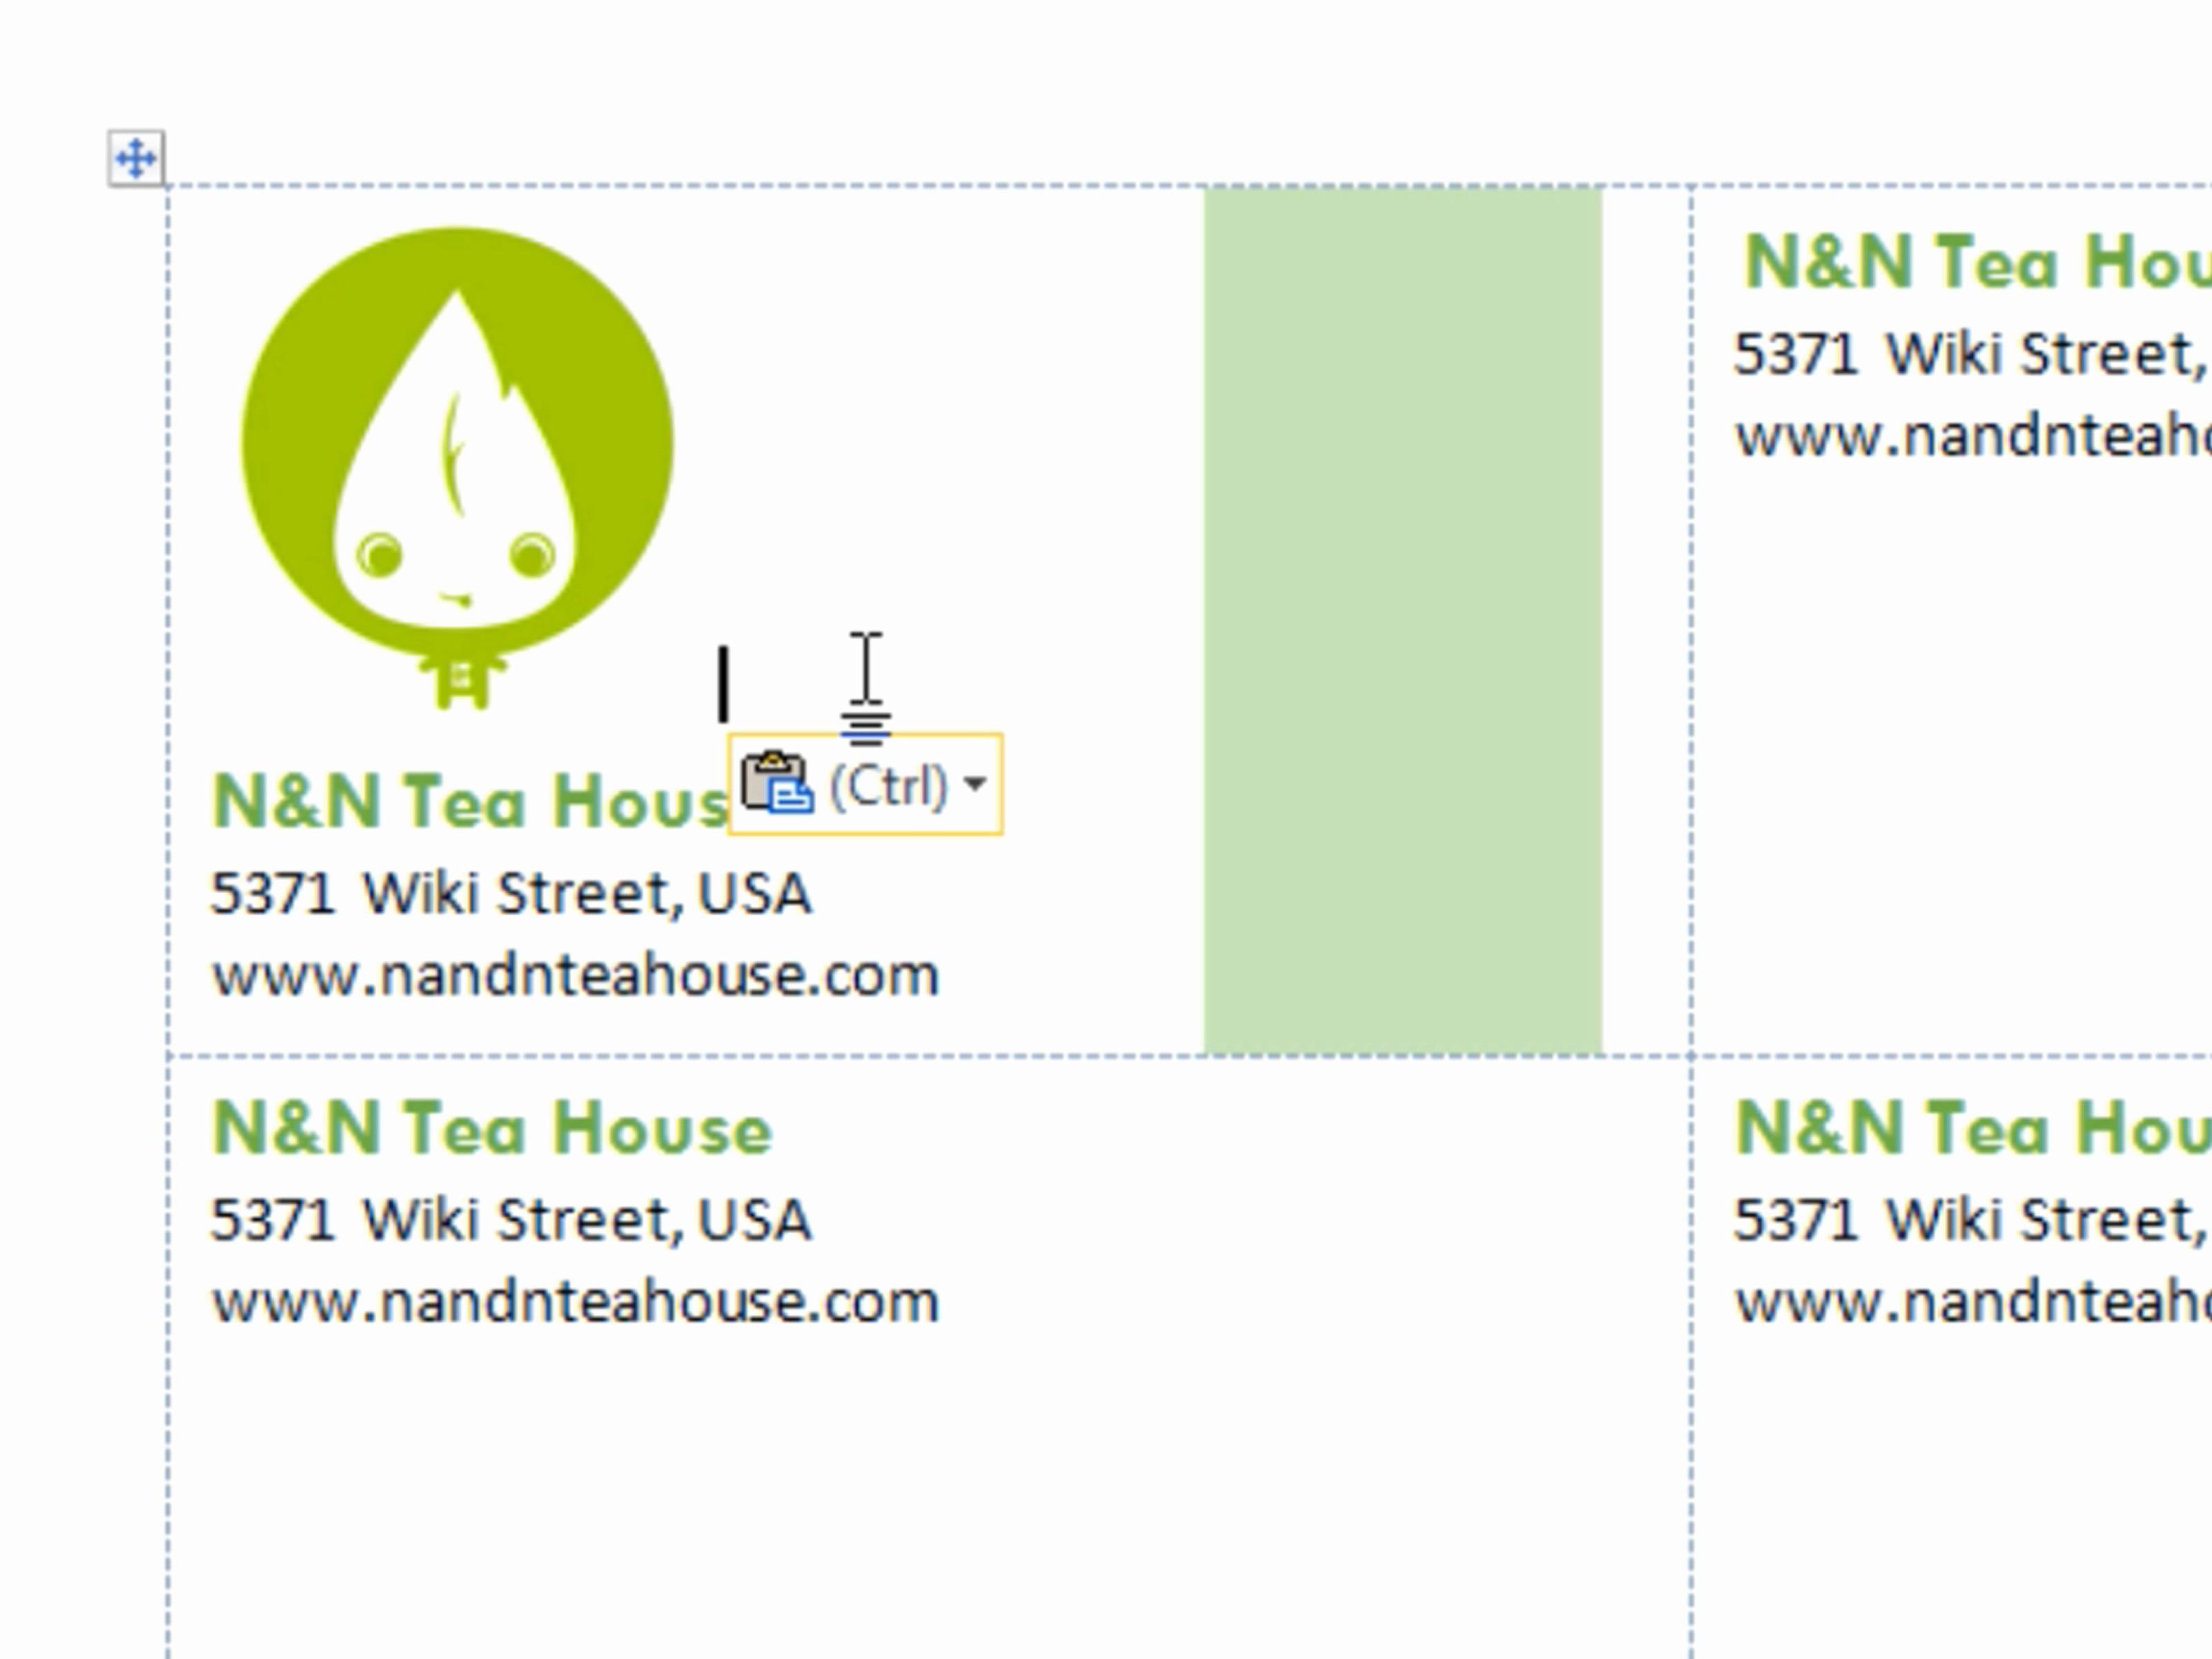 Microsoft Business Card Templates Free Inspirational Business Cards Templates Free for Word